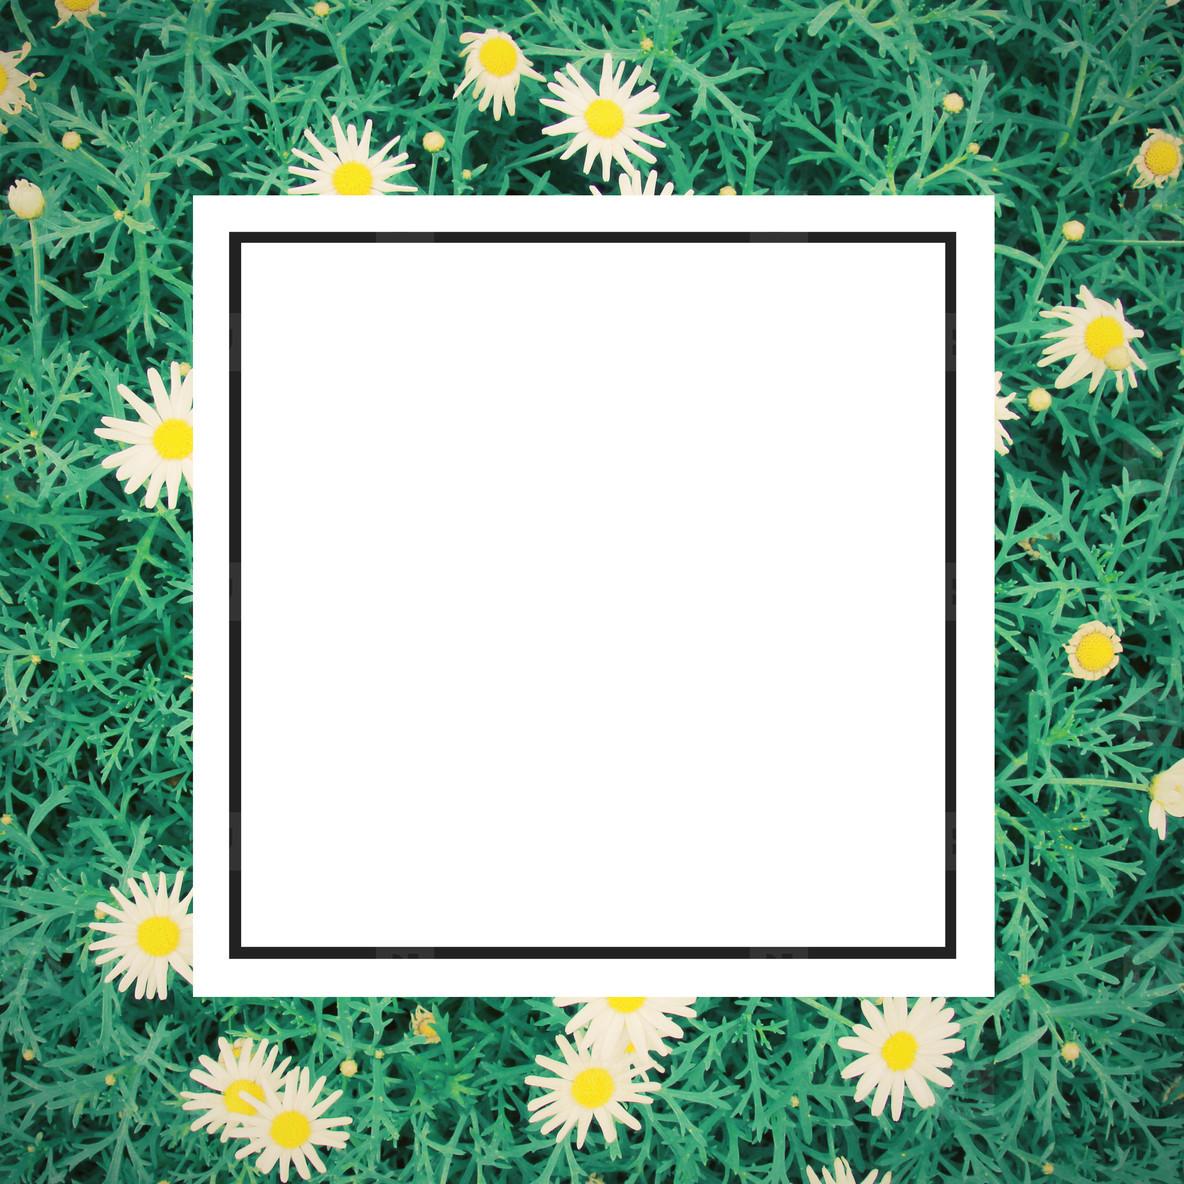 daisy flowes and design frame